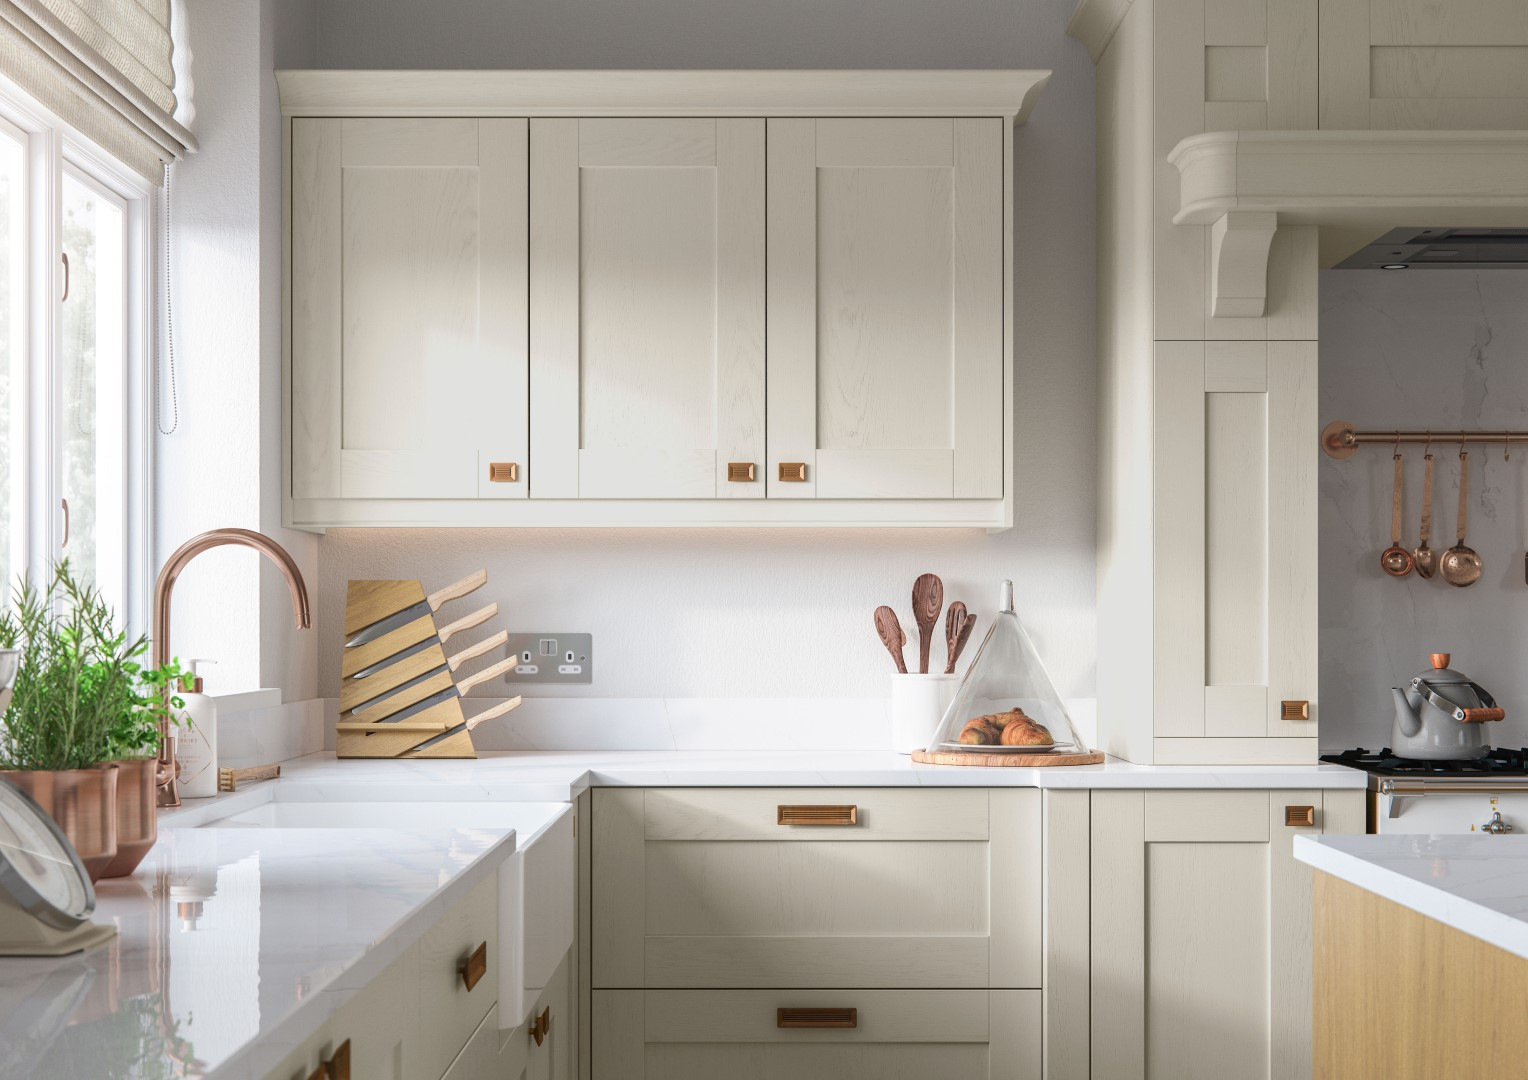 Madison Light Oak and Ivory - Kitchen Design - Alan Kelly Kitchens - Waterford - 4